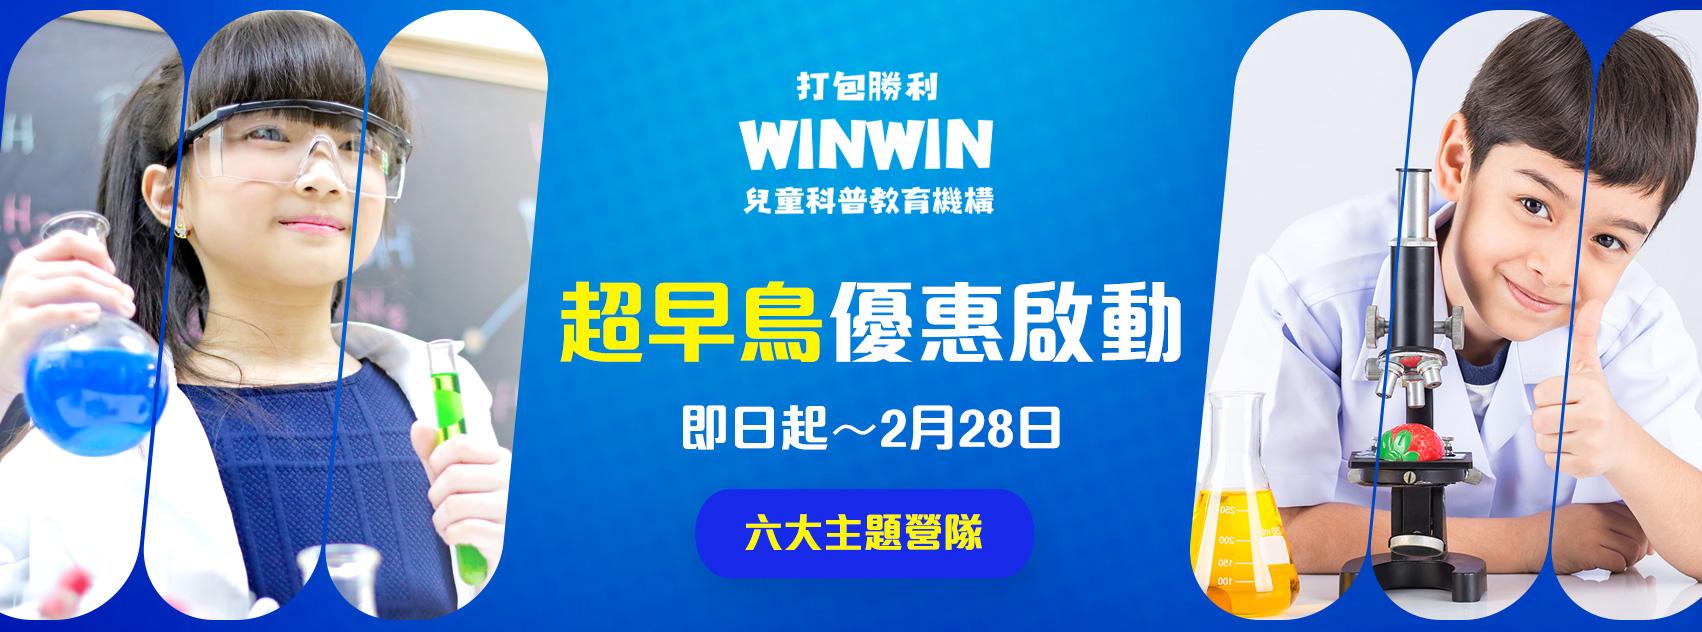 WINWIN打包勝利 夏令營 招生中